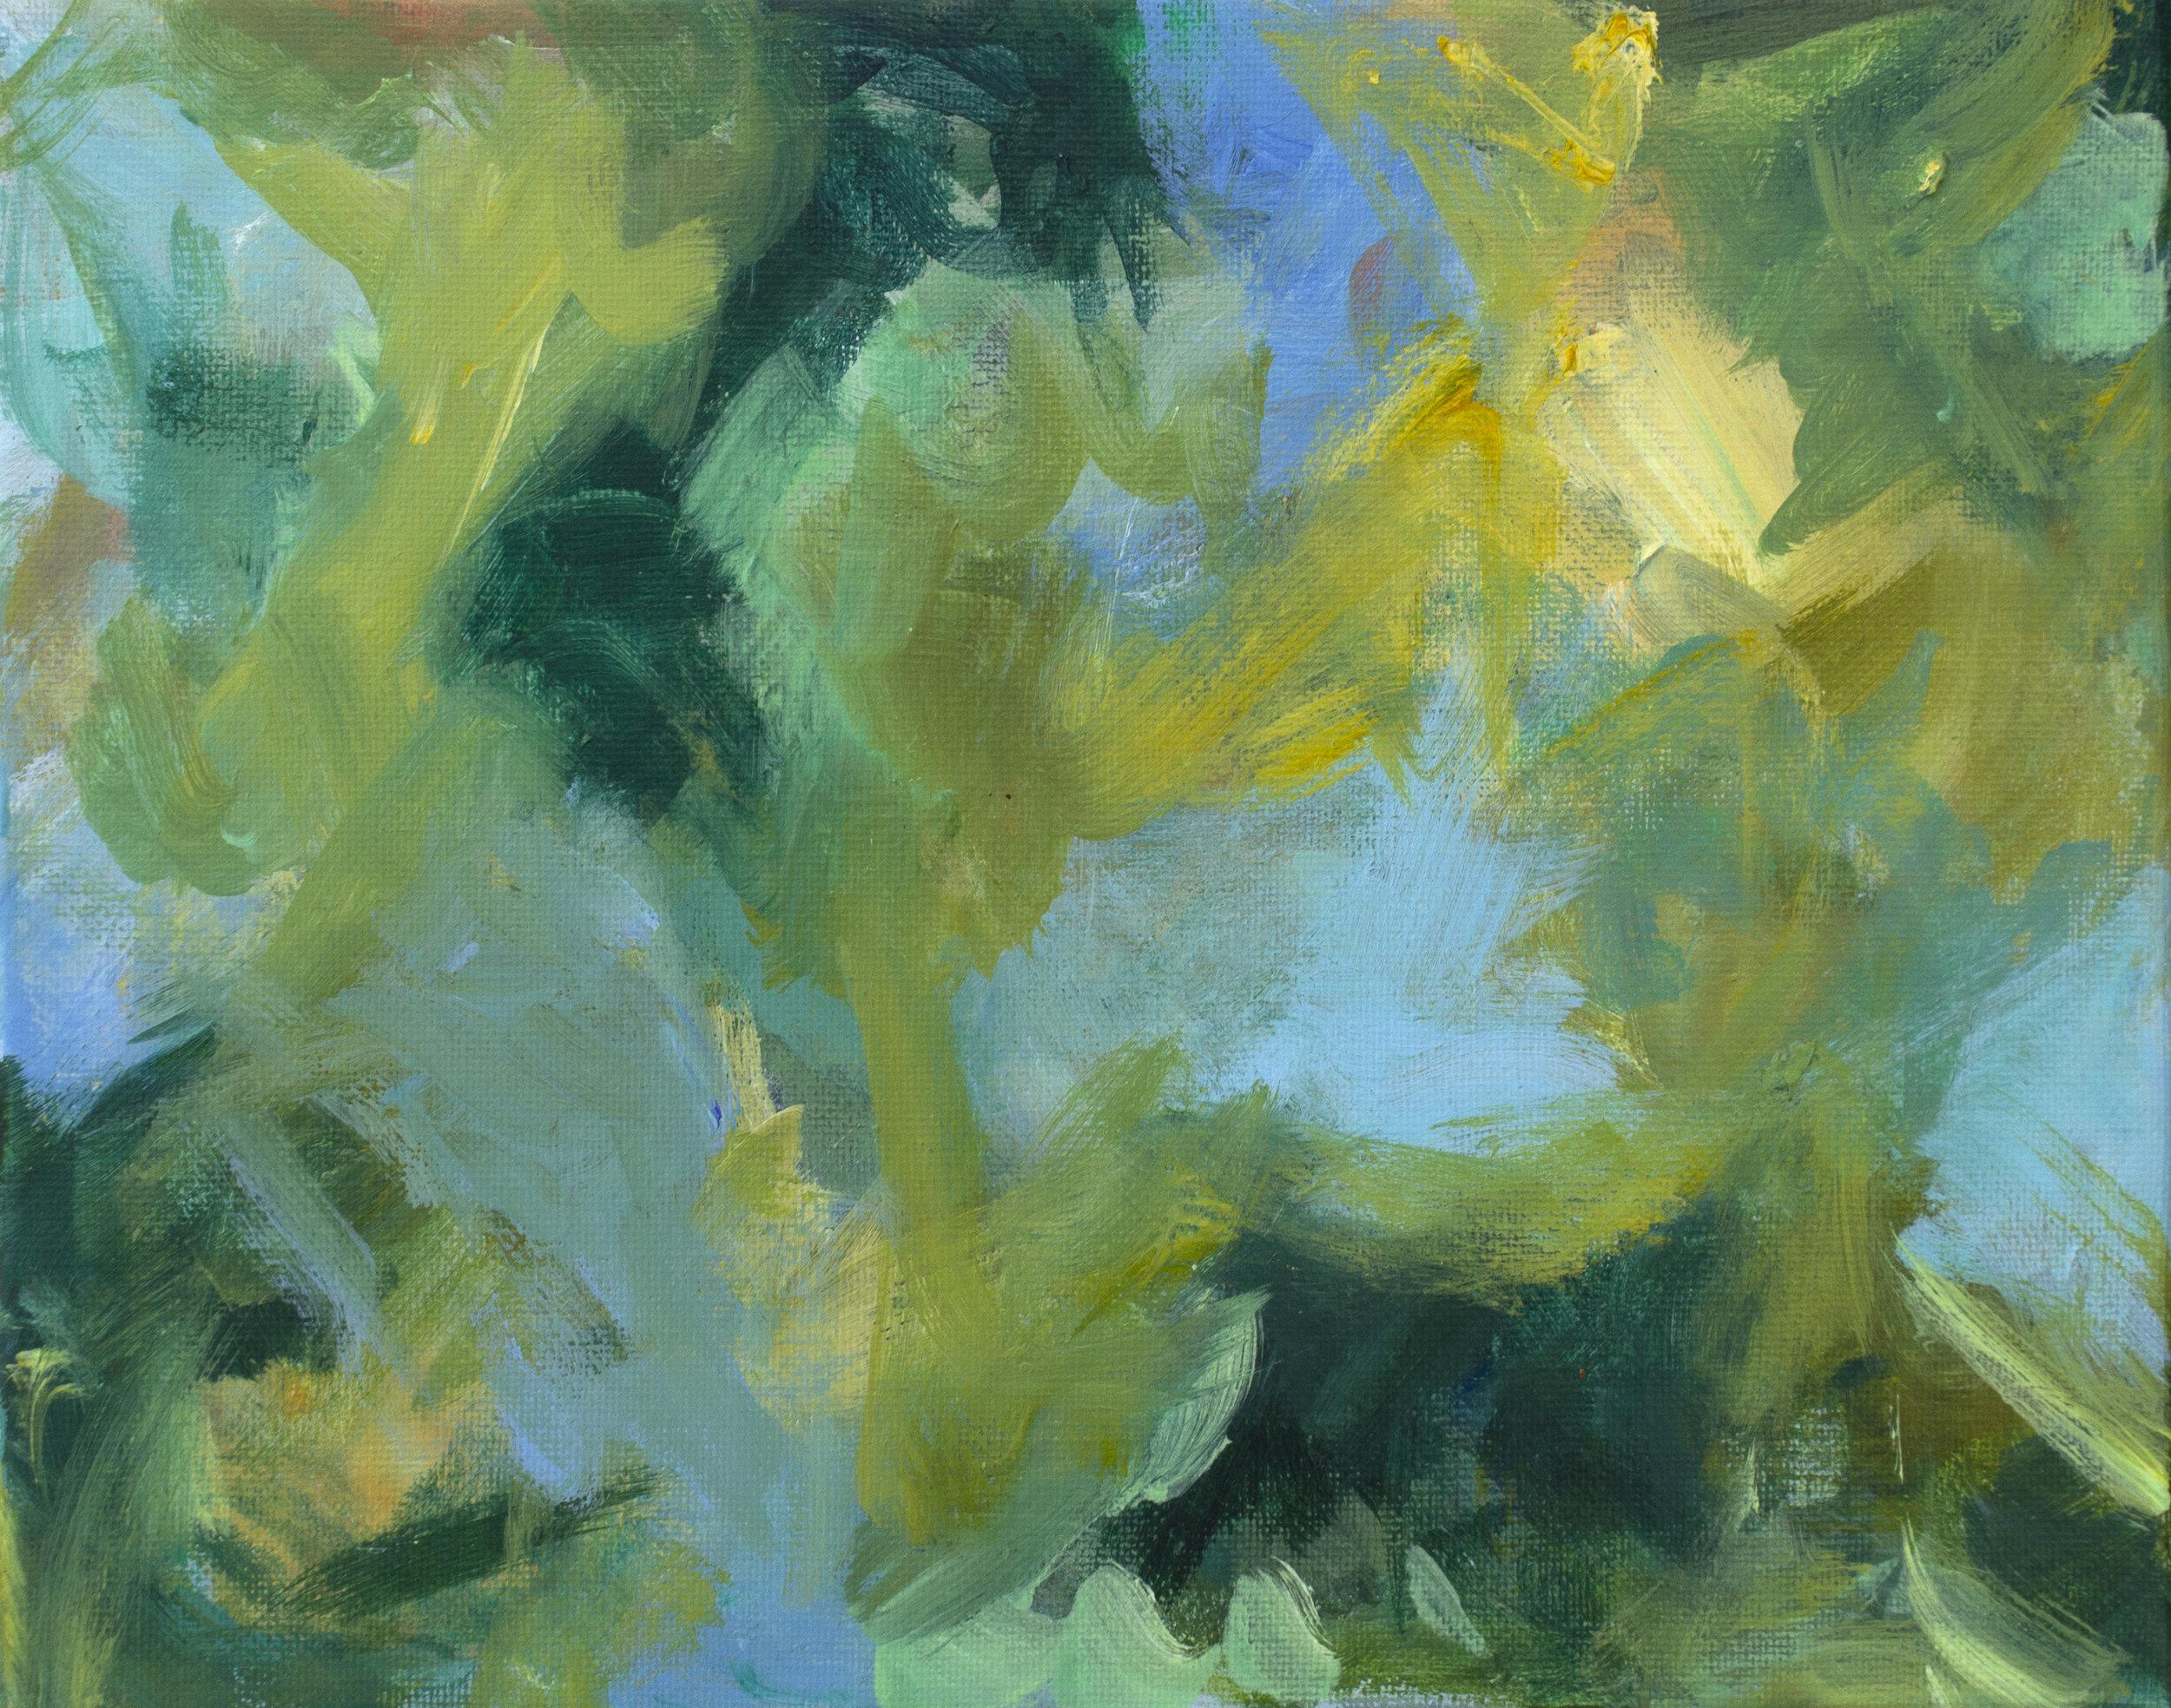 8x10 abstract.jpg